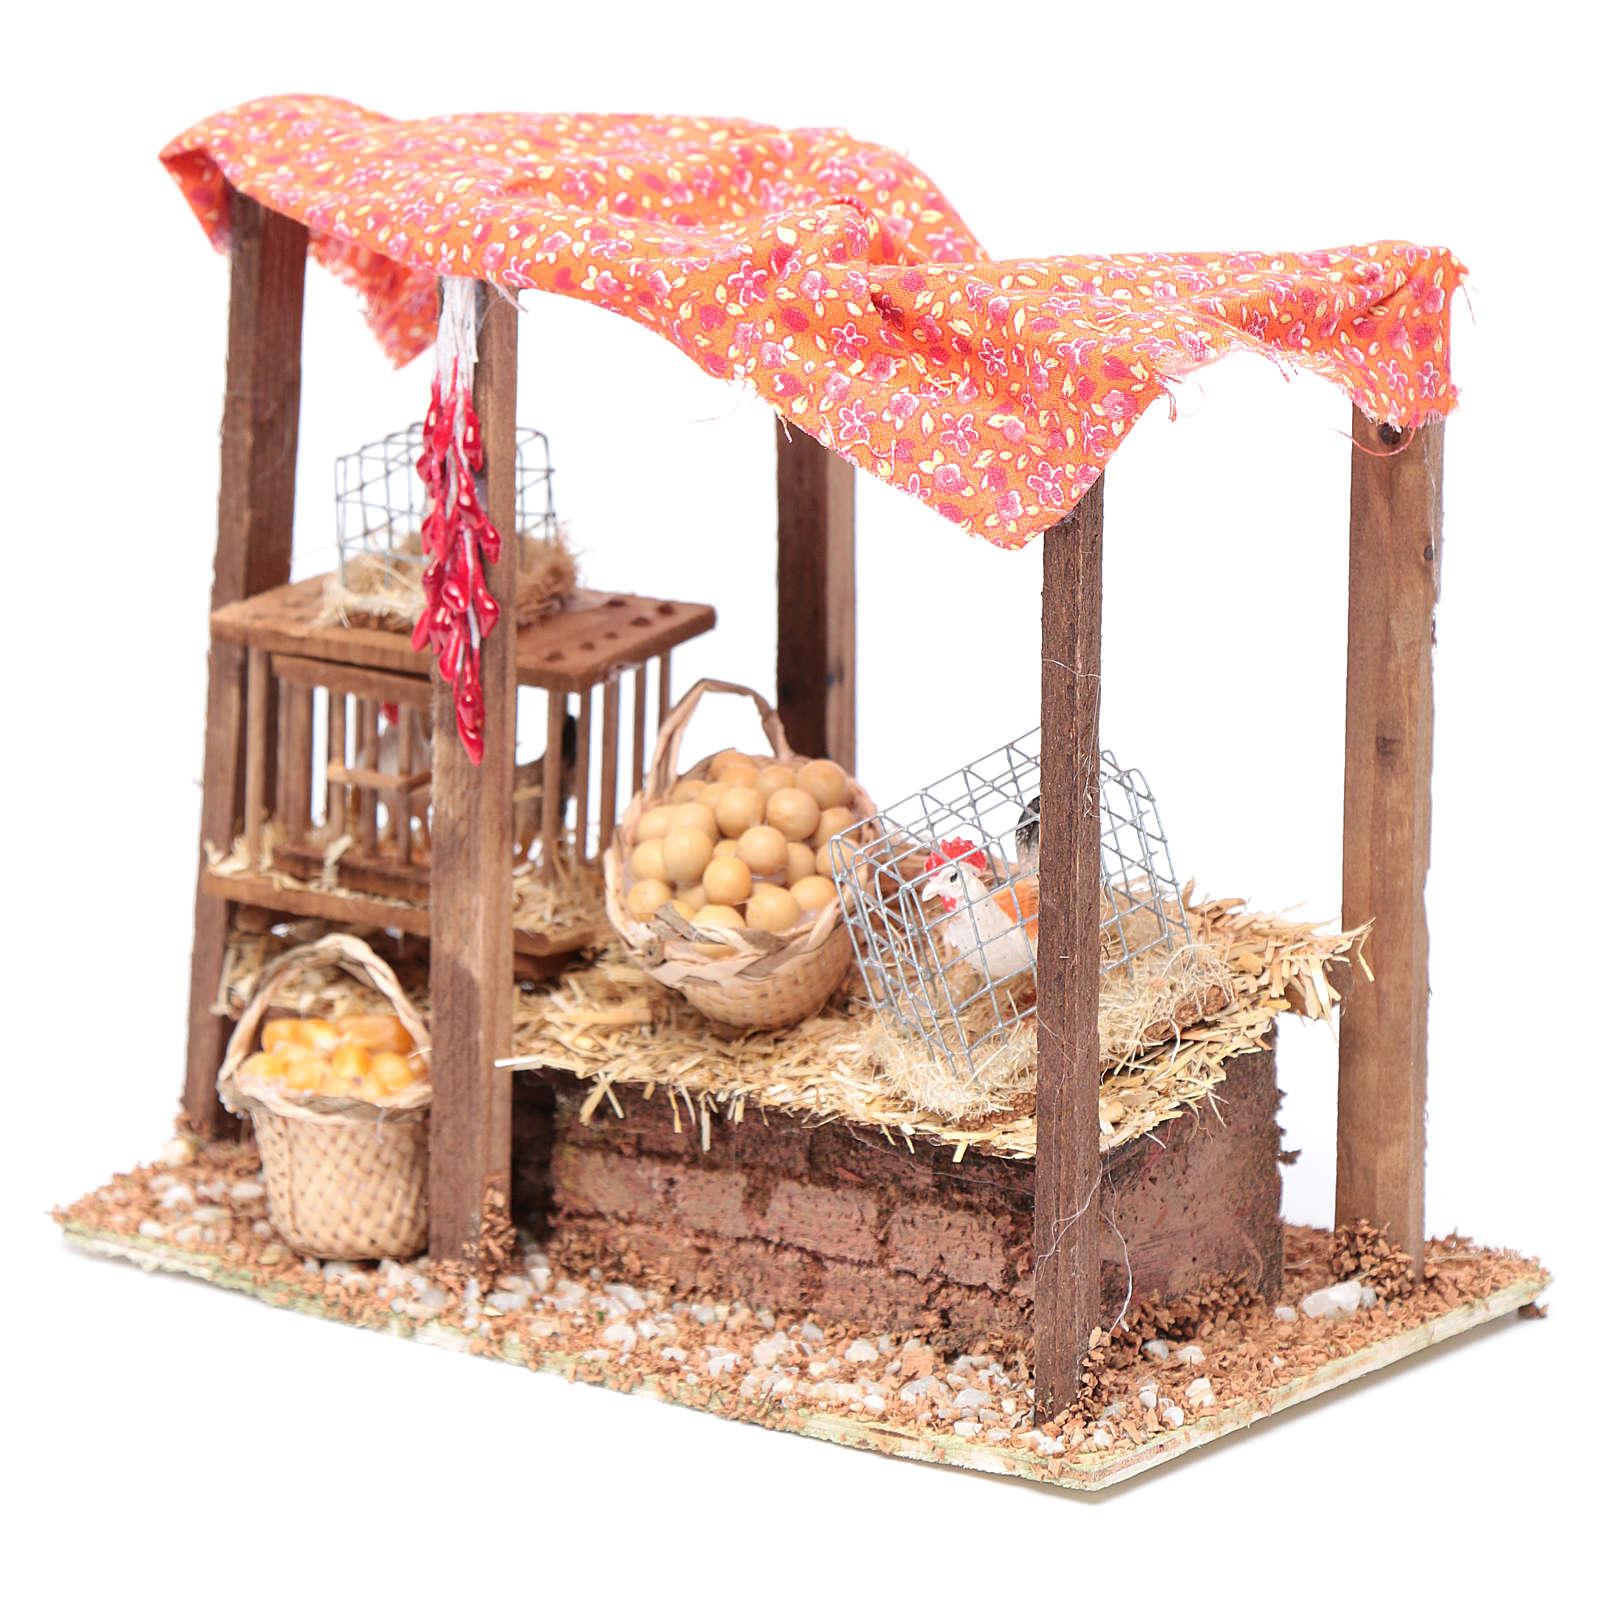 Crib henhouse 15x20x10 cm 3